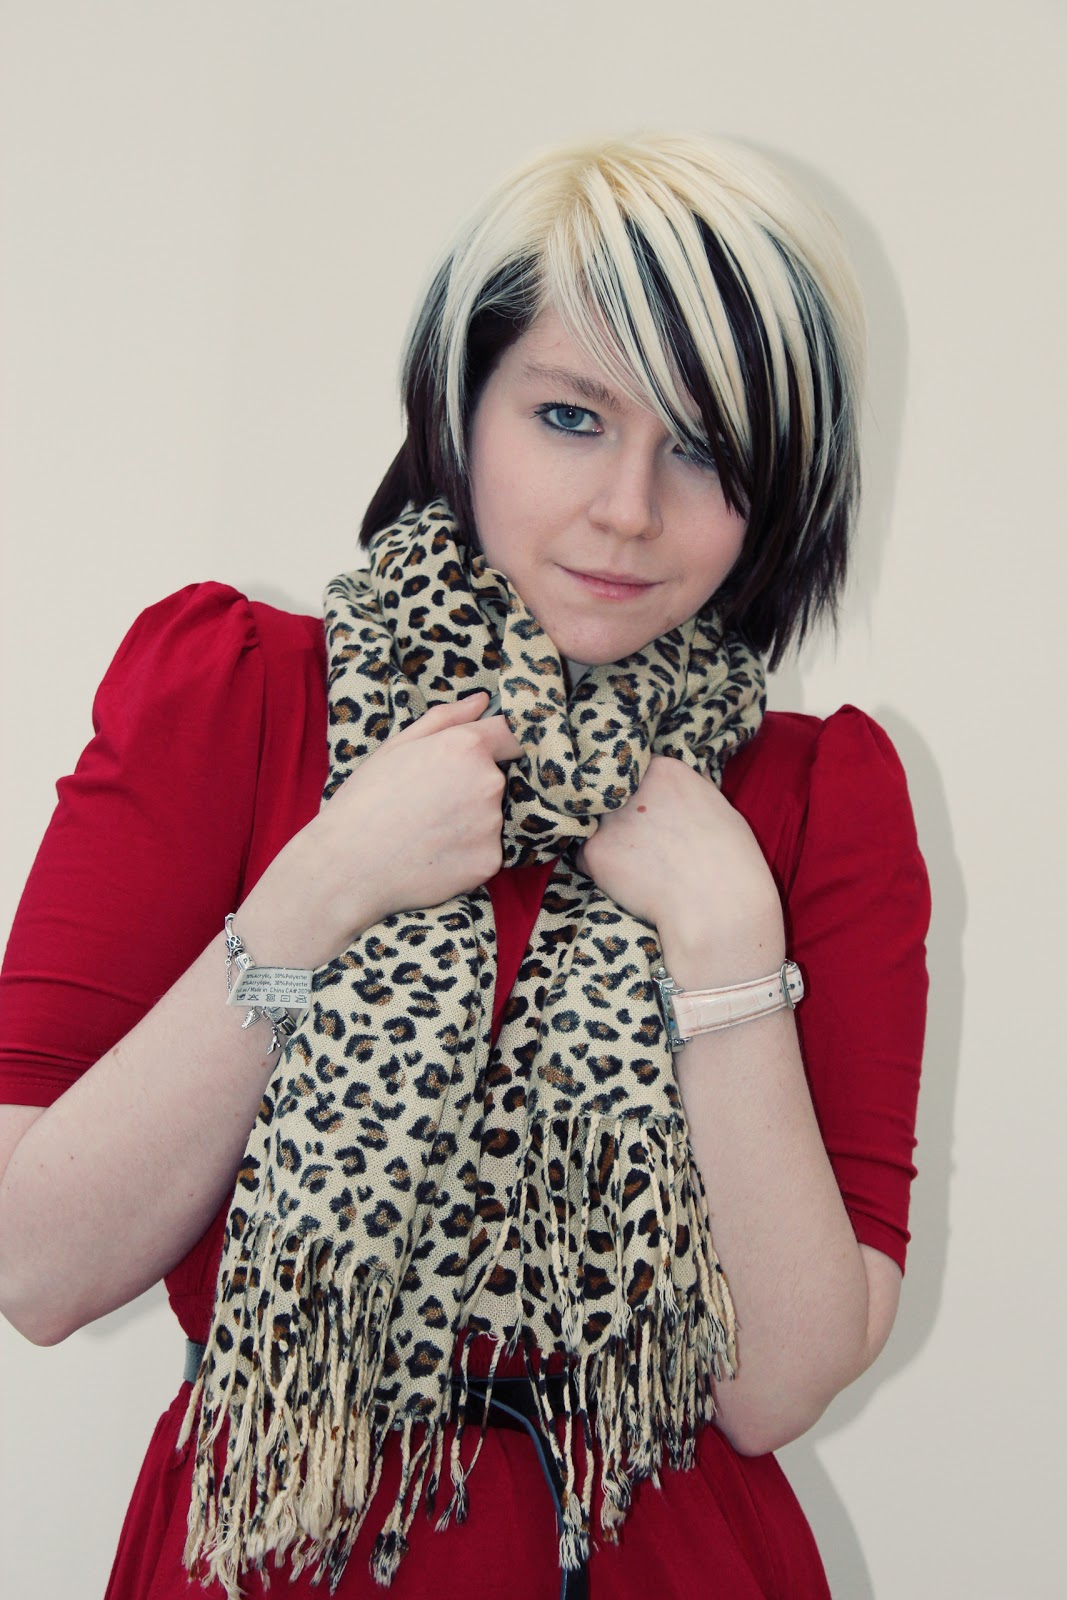 Black Hair With Blonde Underneath | myideasbedroom.com